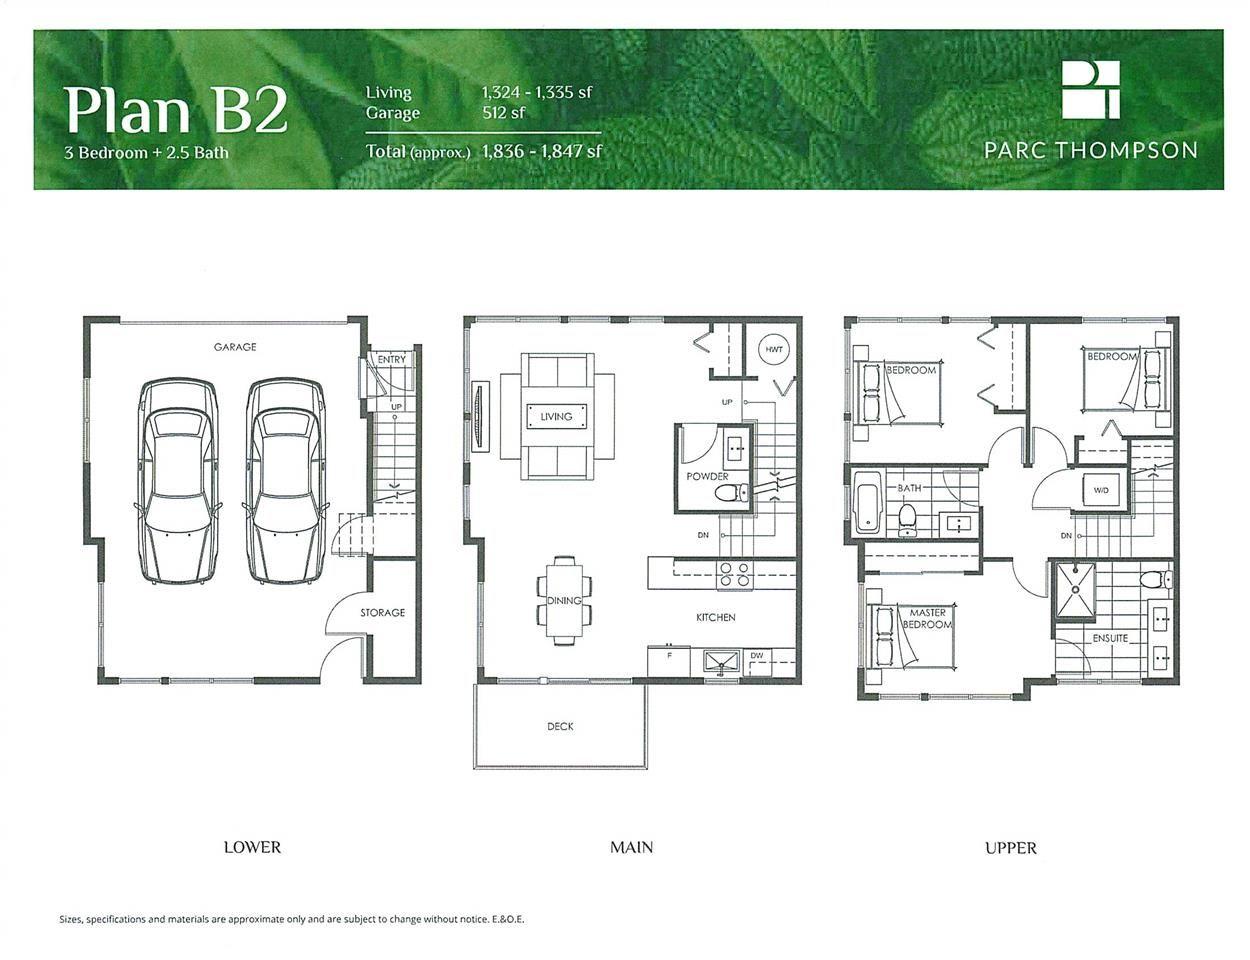 "Main Photo: 11 4300 THOMPSON Road in Richmond: Hamilton RI Townhouse for sale in ""Parc Thompson"" : MLS®# R2534362"